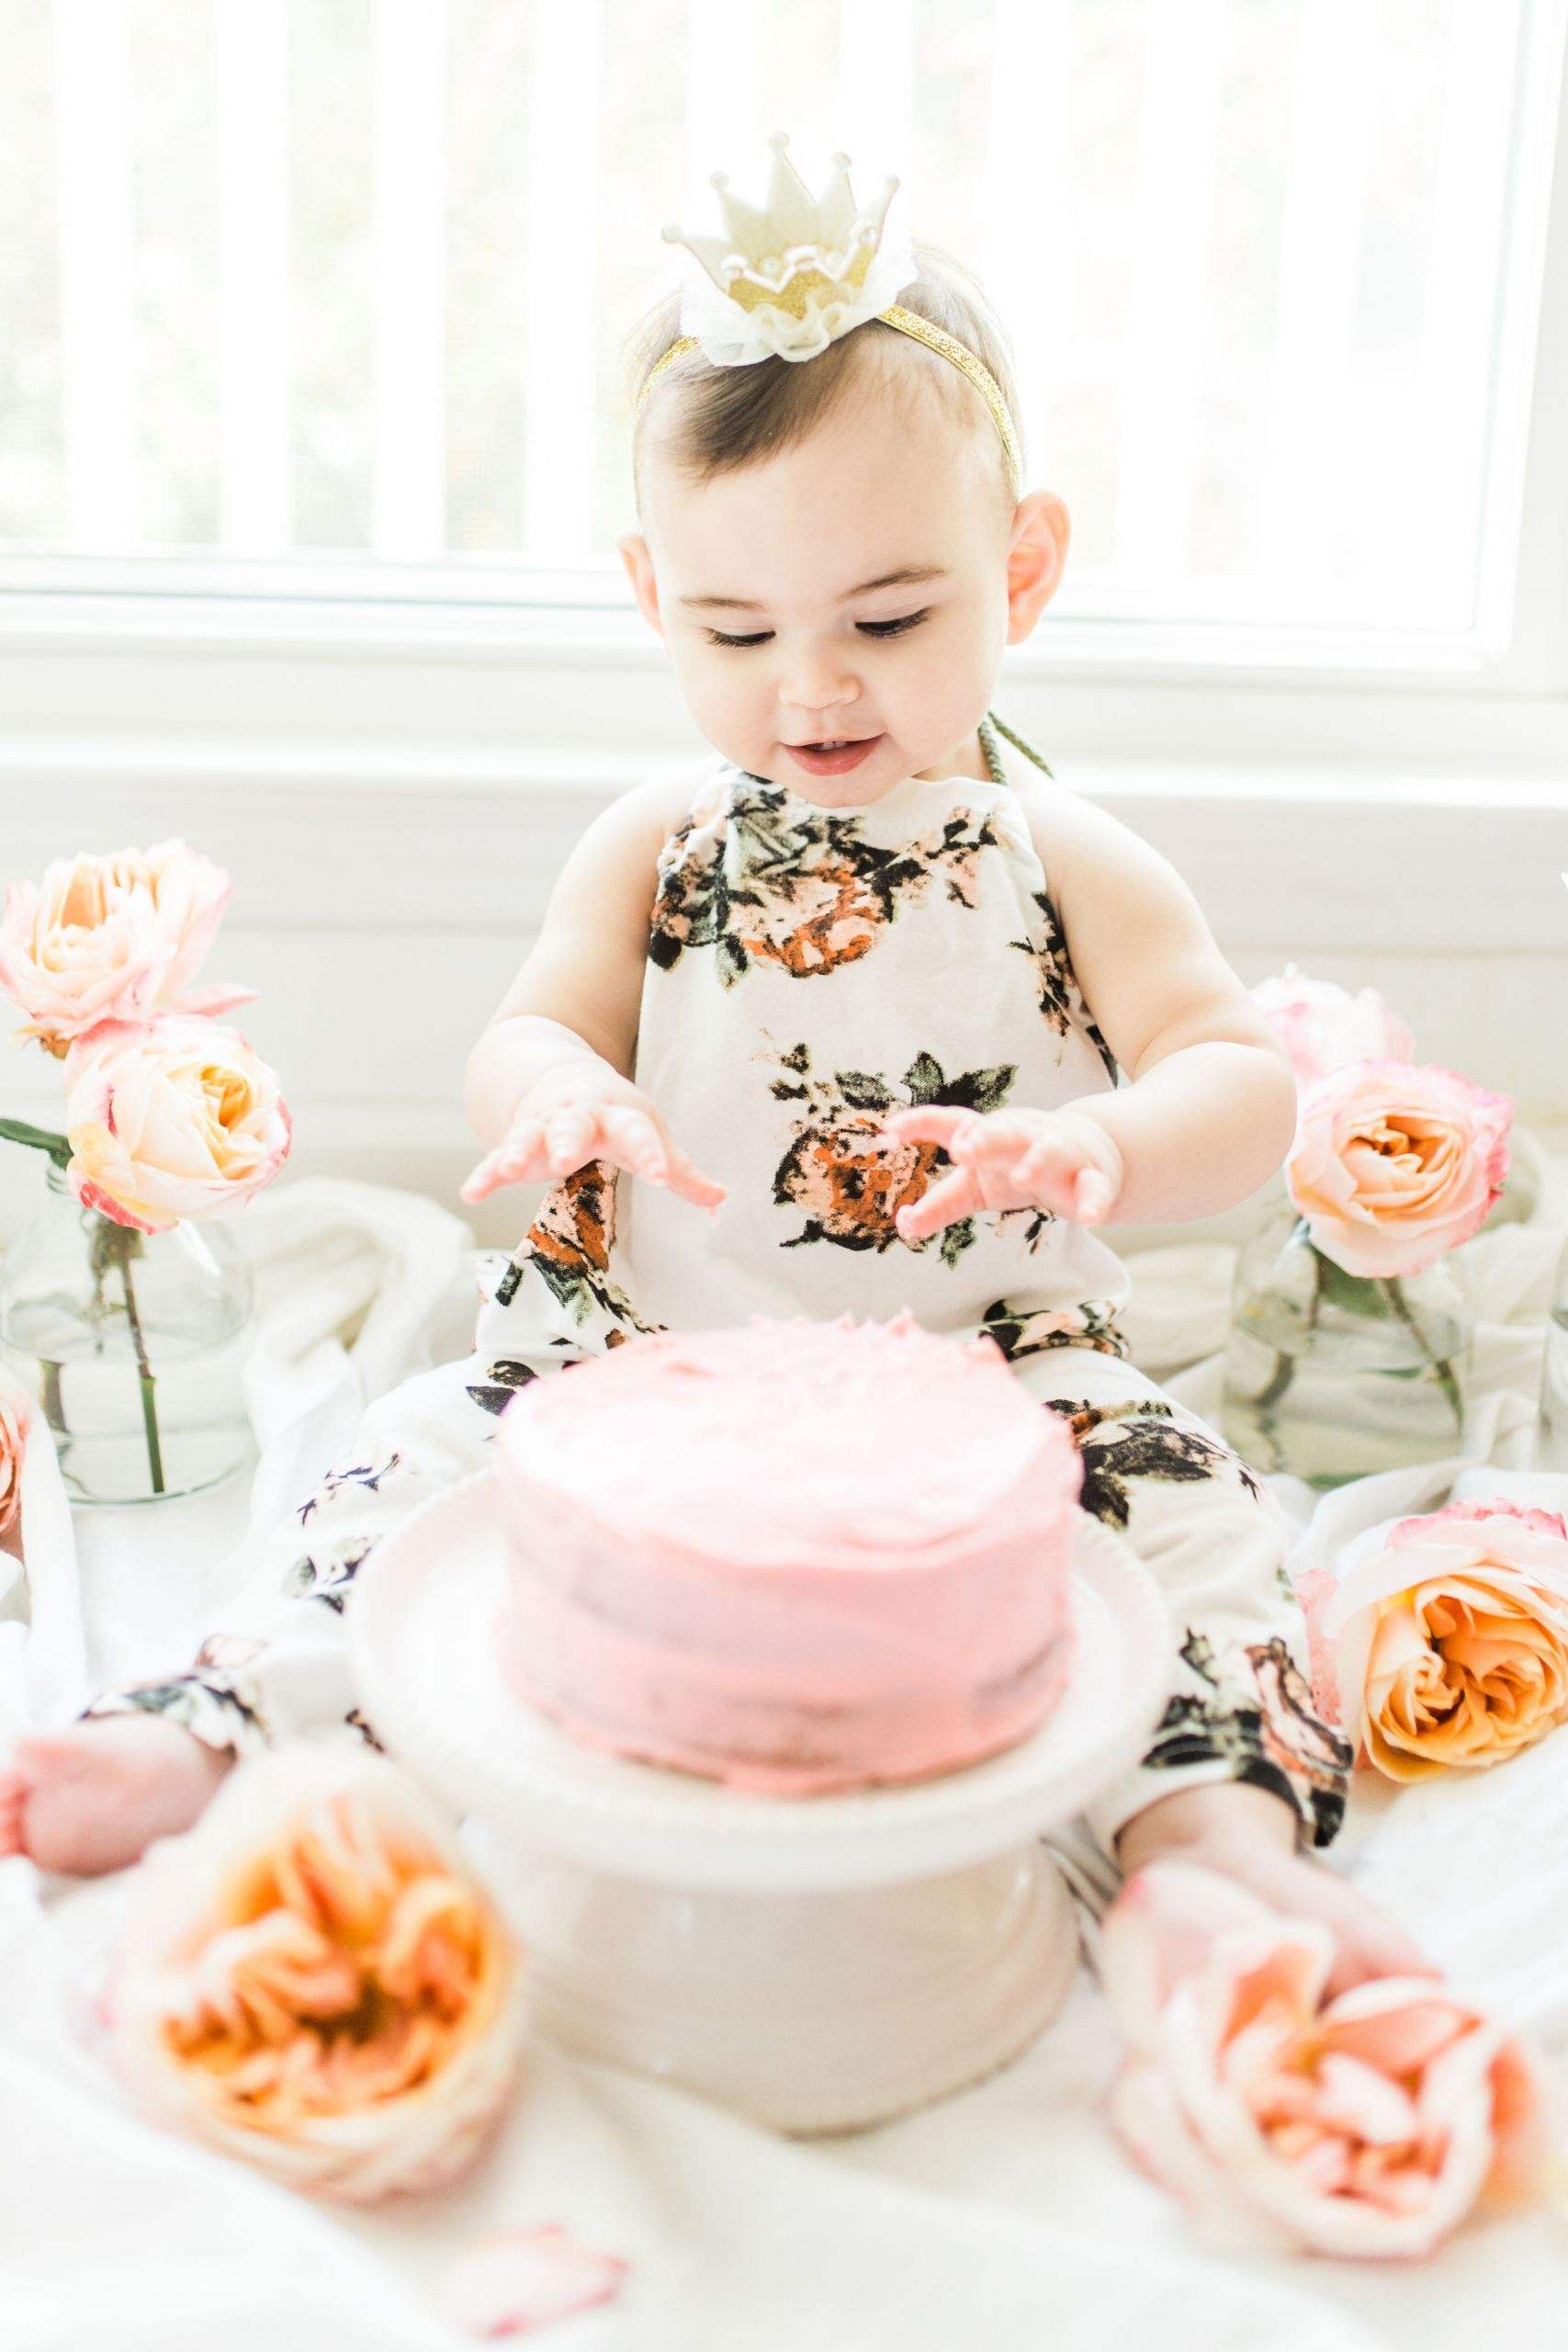 Birthday Smash Cake  First Birthday Smash Cake Vanilla Crazy Cake Recipe